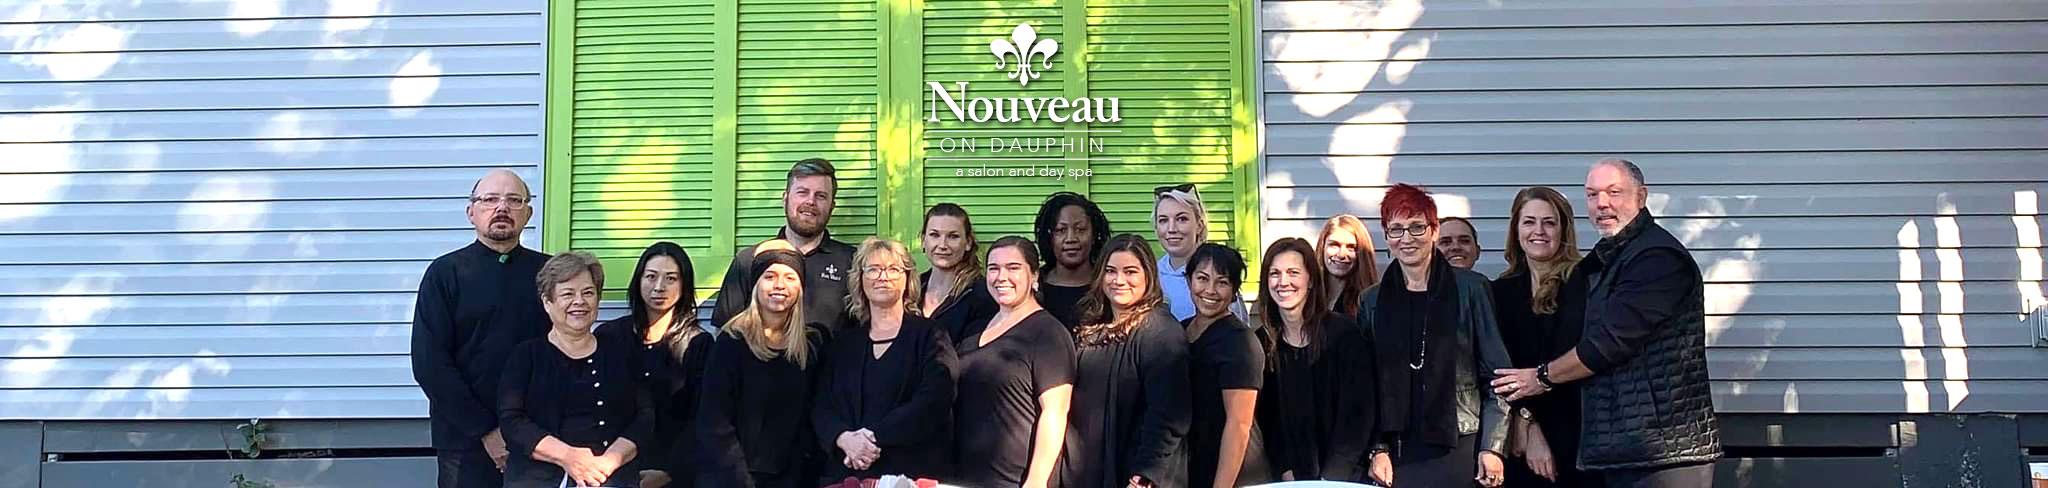 nouveau-day-spa-staff-2020